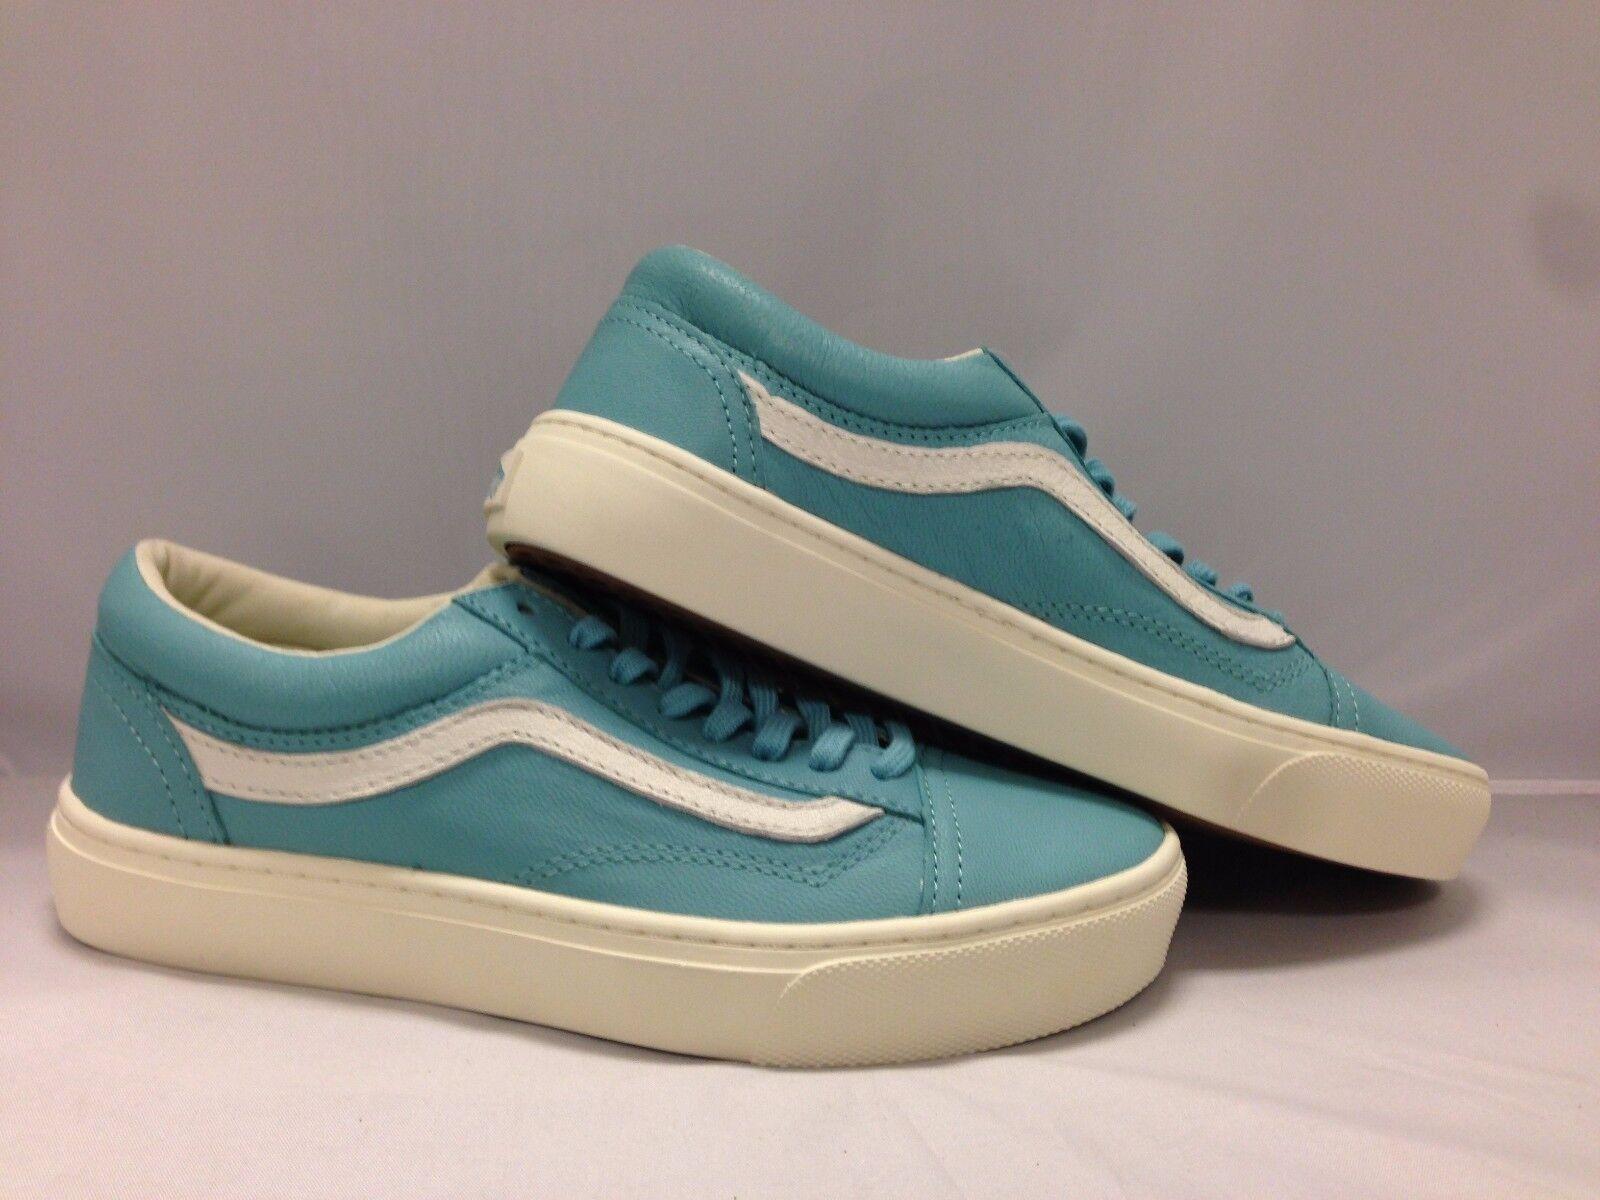 Vans Men's shoes  Old skool''--(Leather)--Aqua Sea